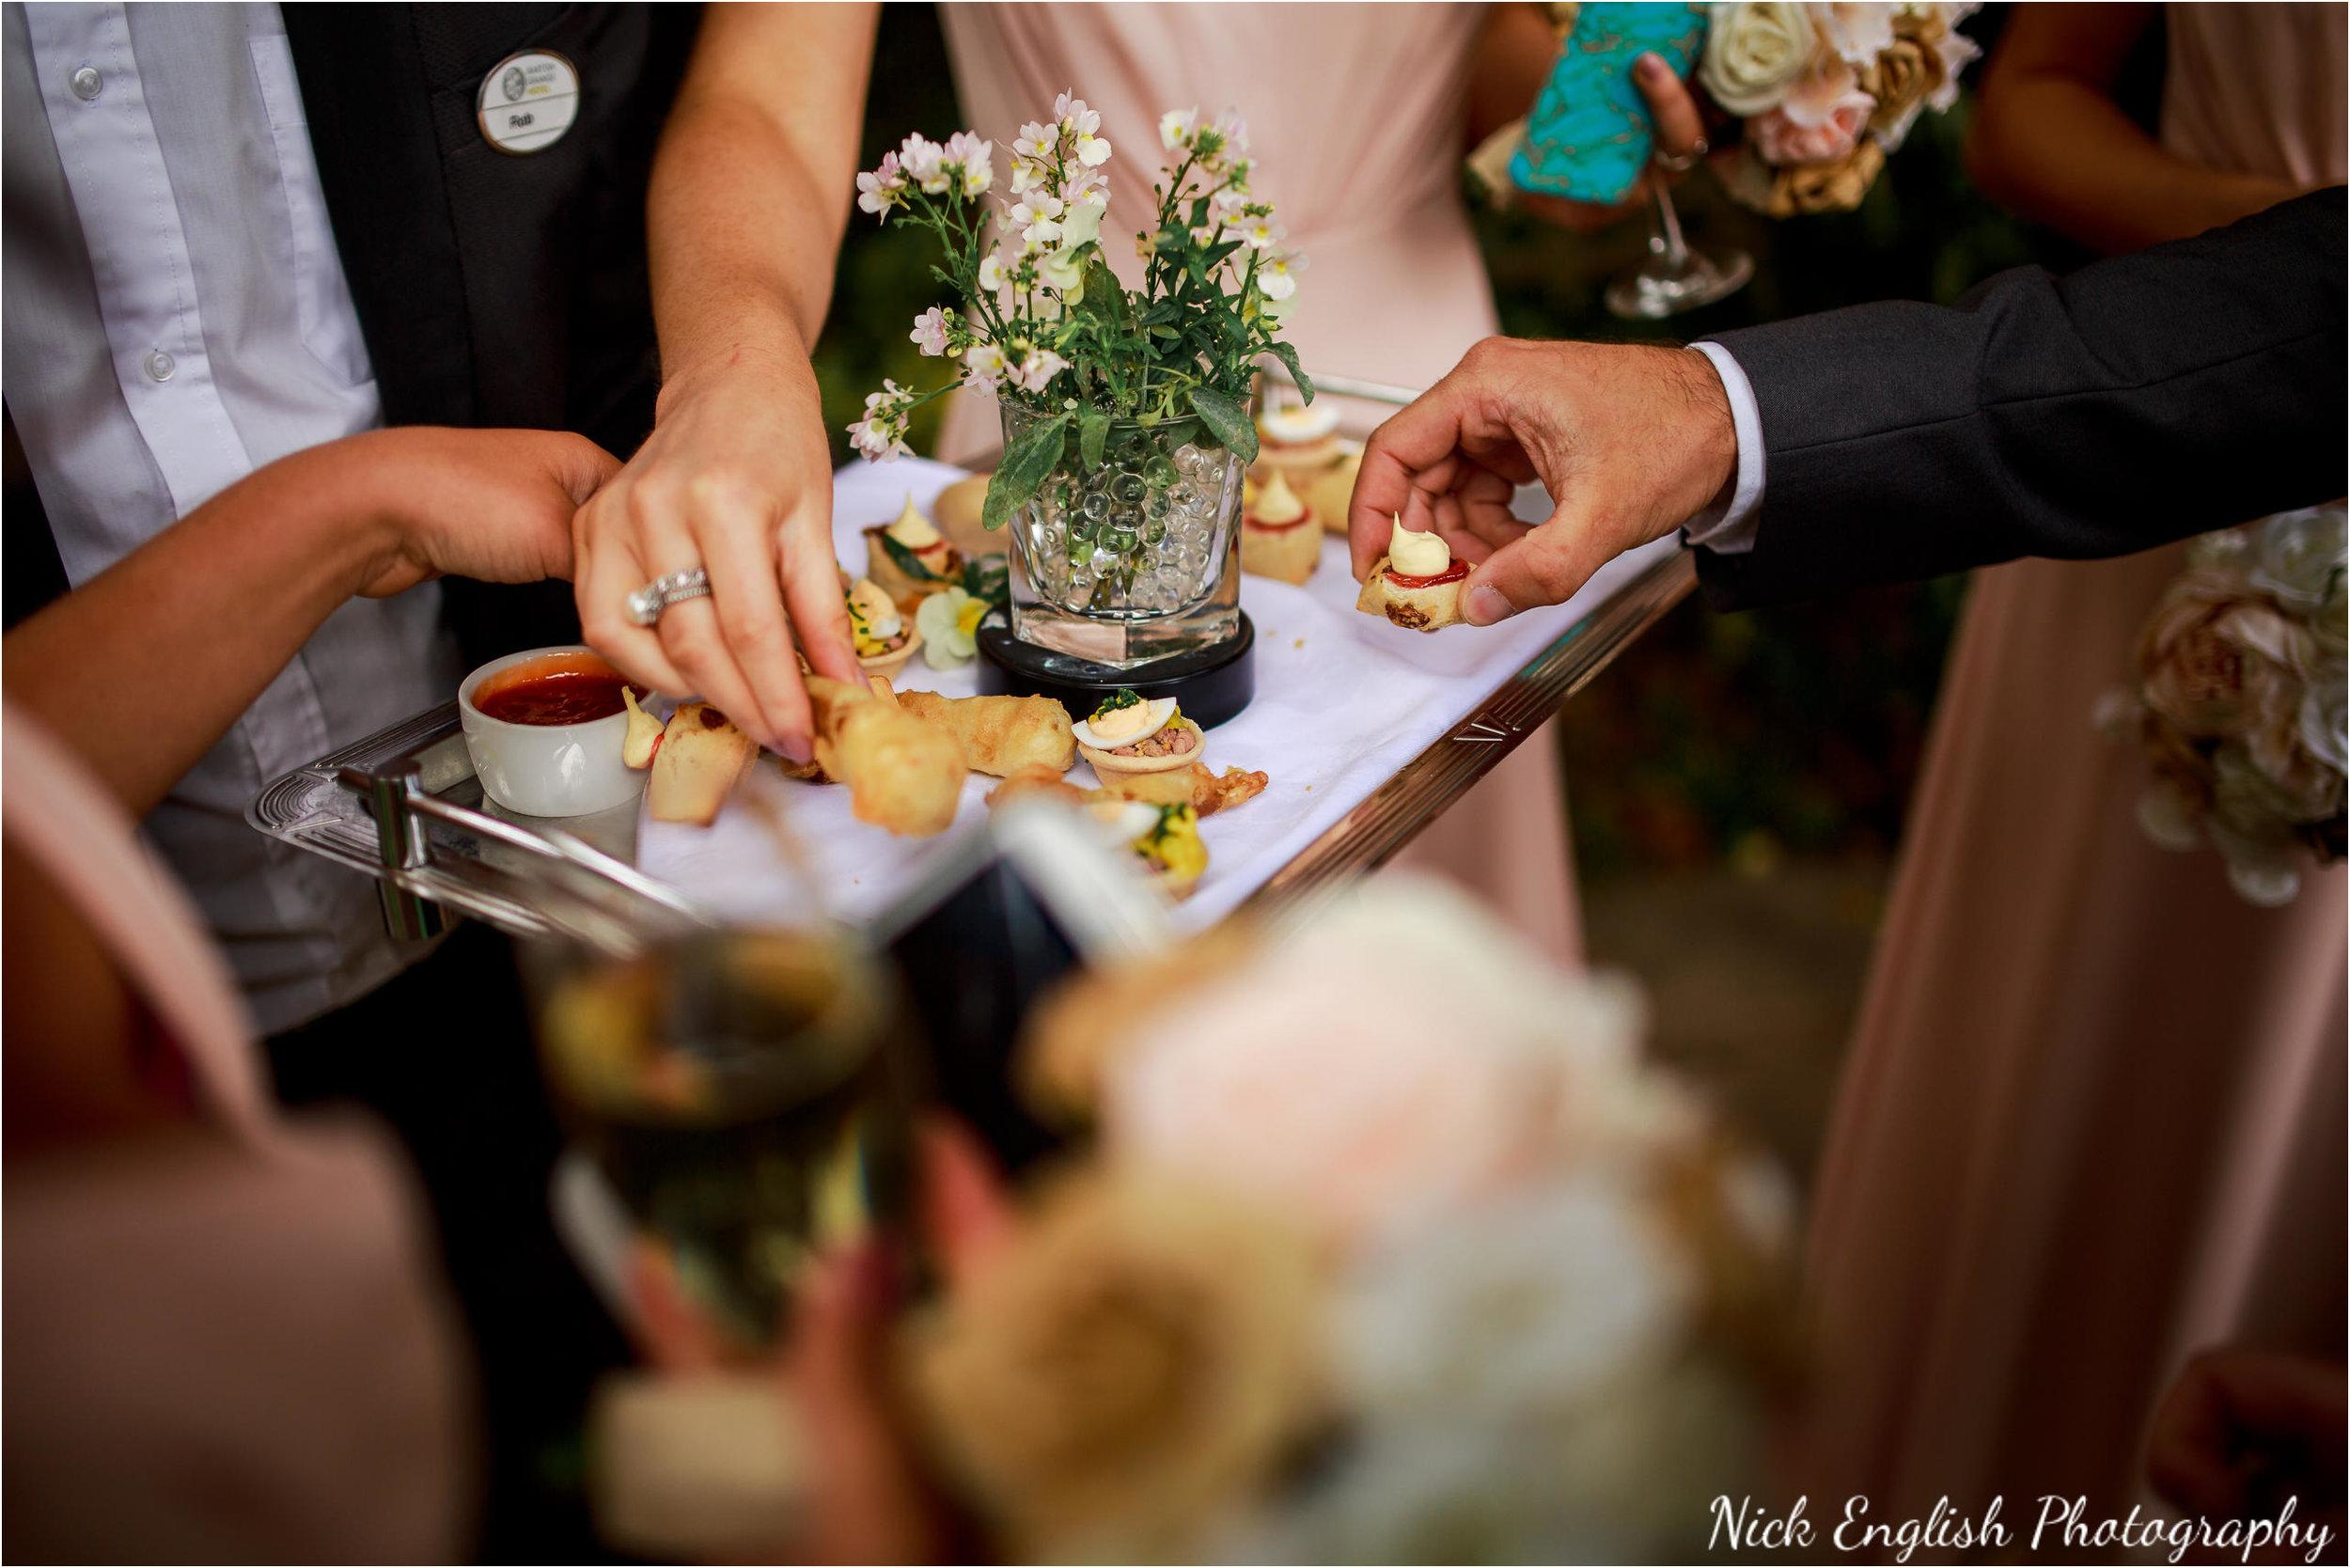 Emily David Wedding Photographs at Barton Grange Preston by Nick English Photography 103jpg.jpeg